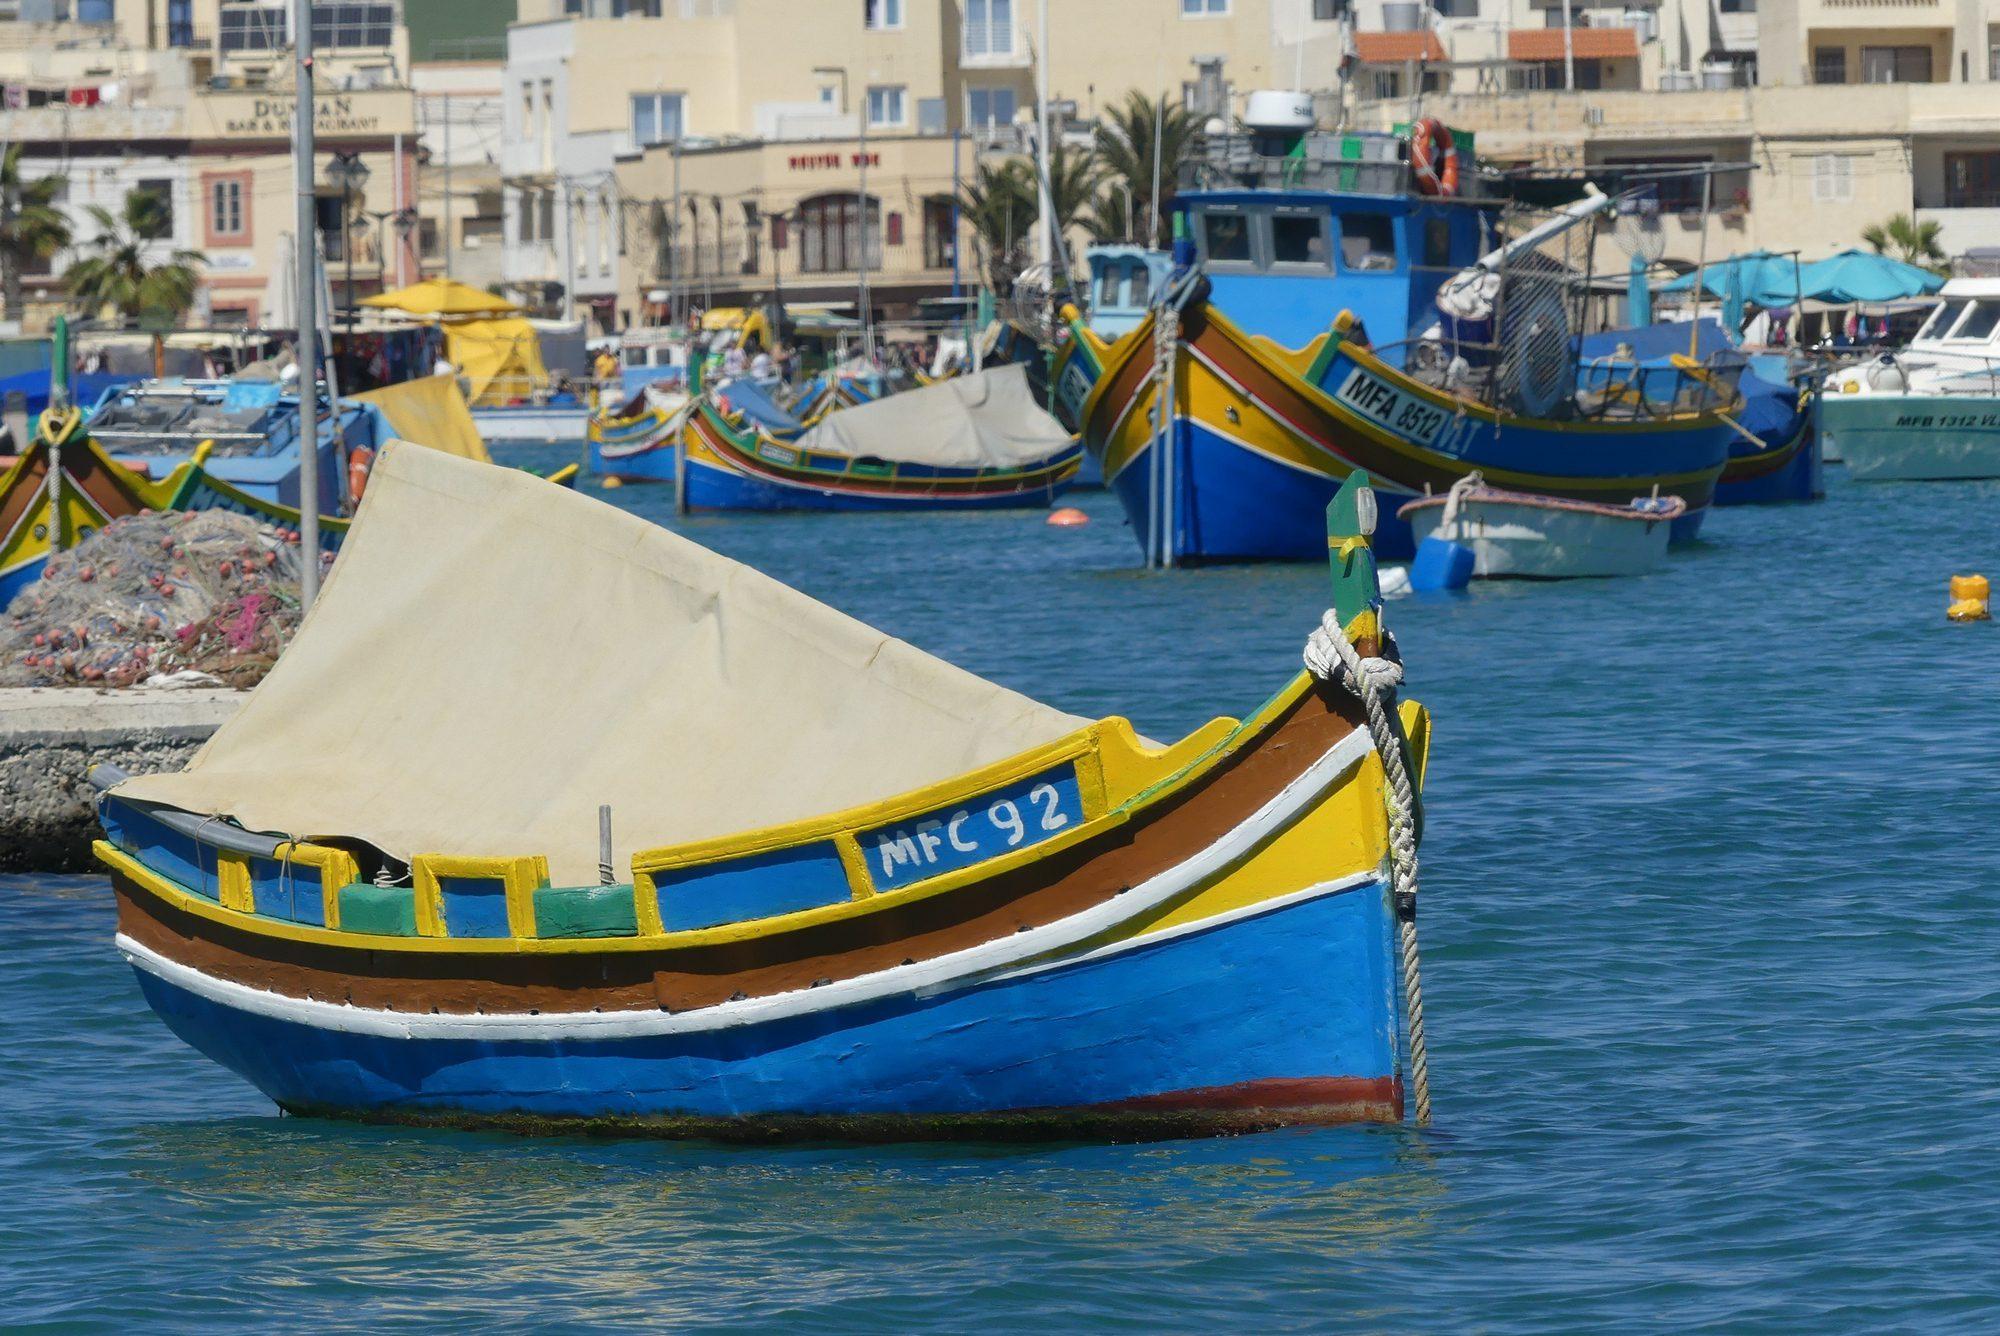 Luzzu in Marsaxlokk Malta